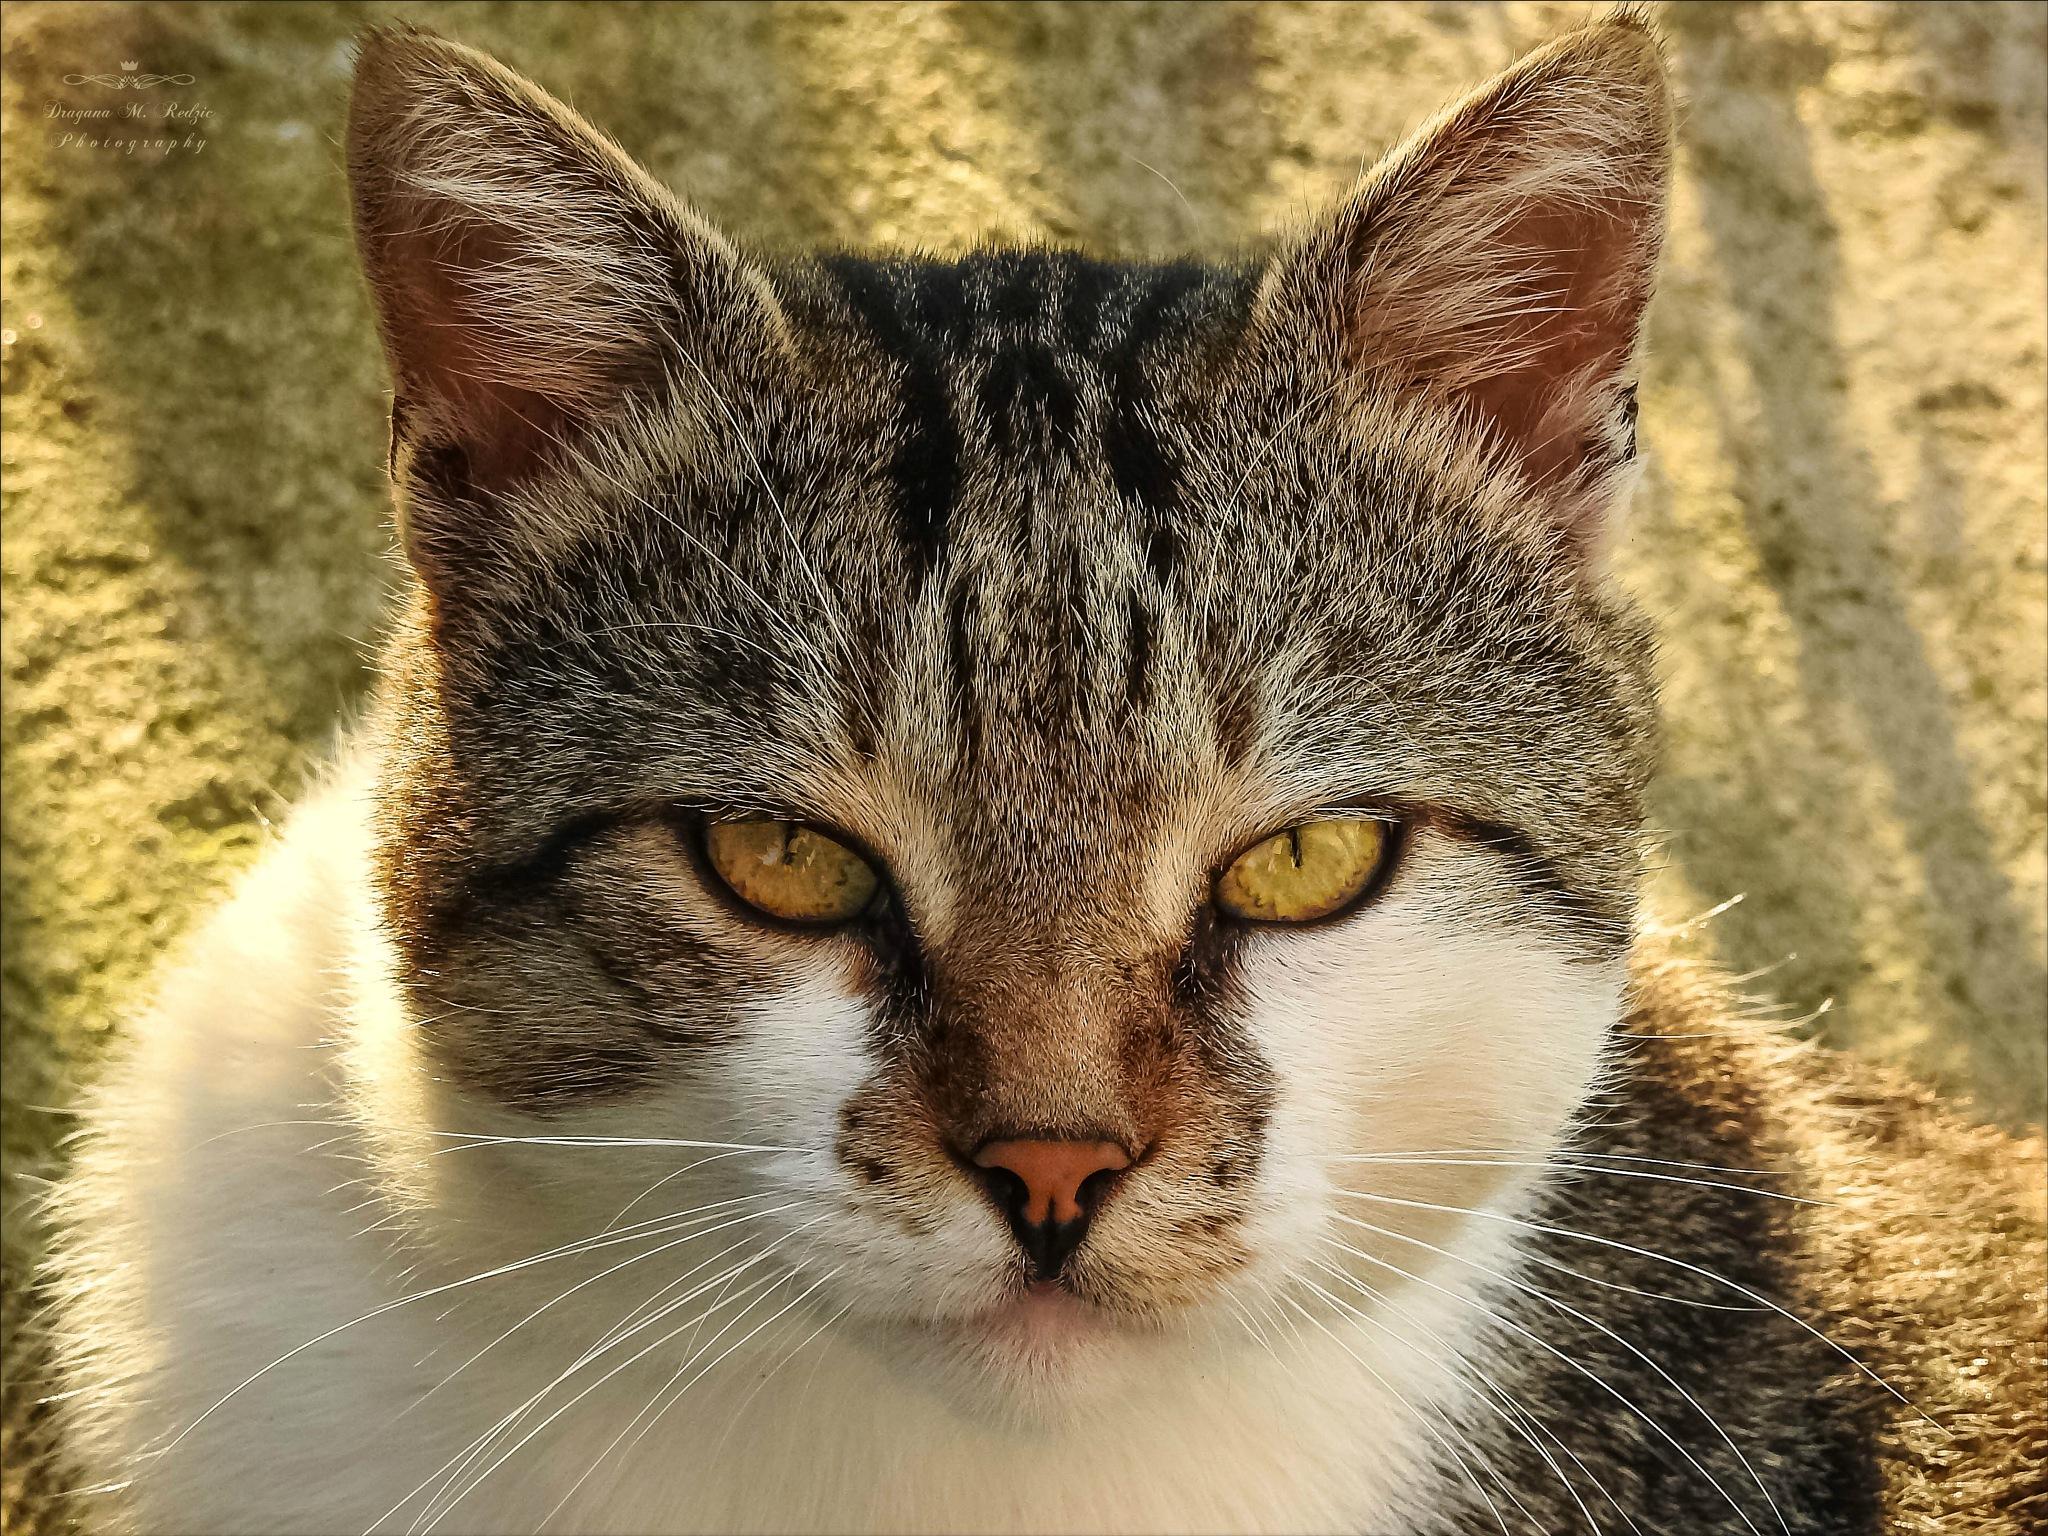 Serious Cat - Cat Tom by Драгана М. Реџић